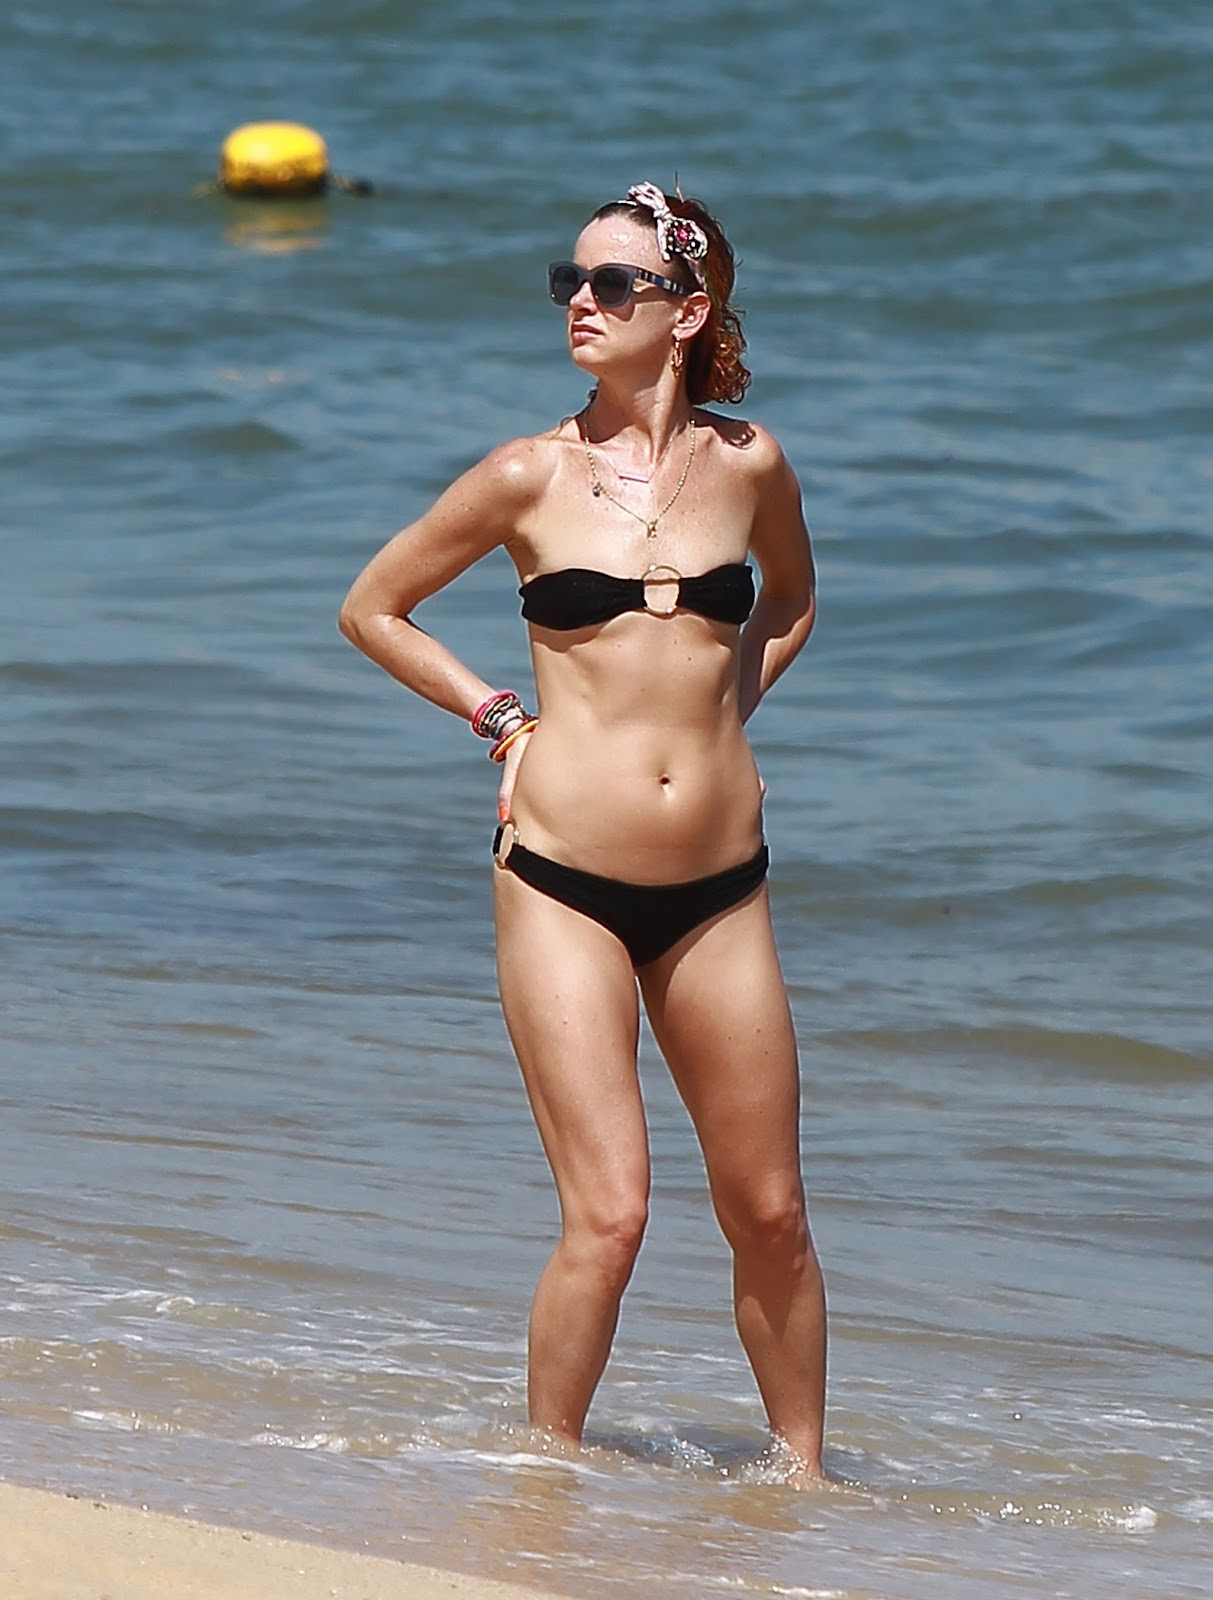 http://1.bp.blogspot.com/-C7FuyoShvus/UDaStXnUQMI/AAAAAAAAM78/EaSX3UO35Q8/s1600/Juliette+Lewis++Bikini+Candids+on+vacation+in+Mexico+August+17th+2012.jpg